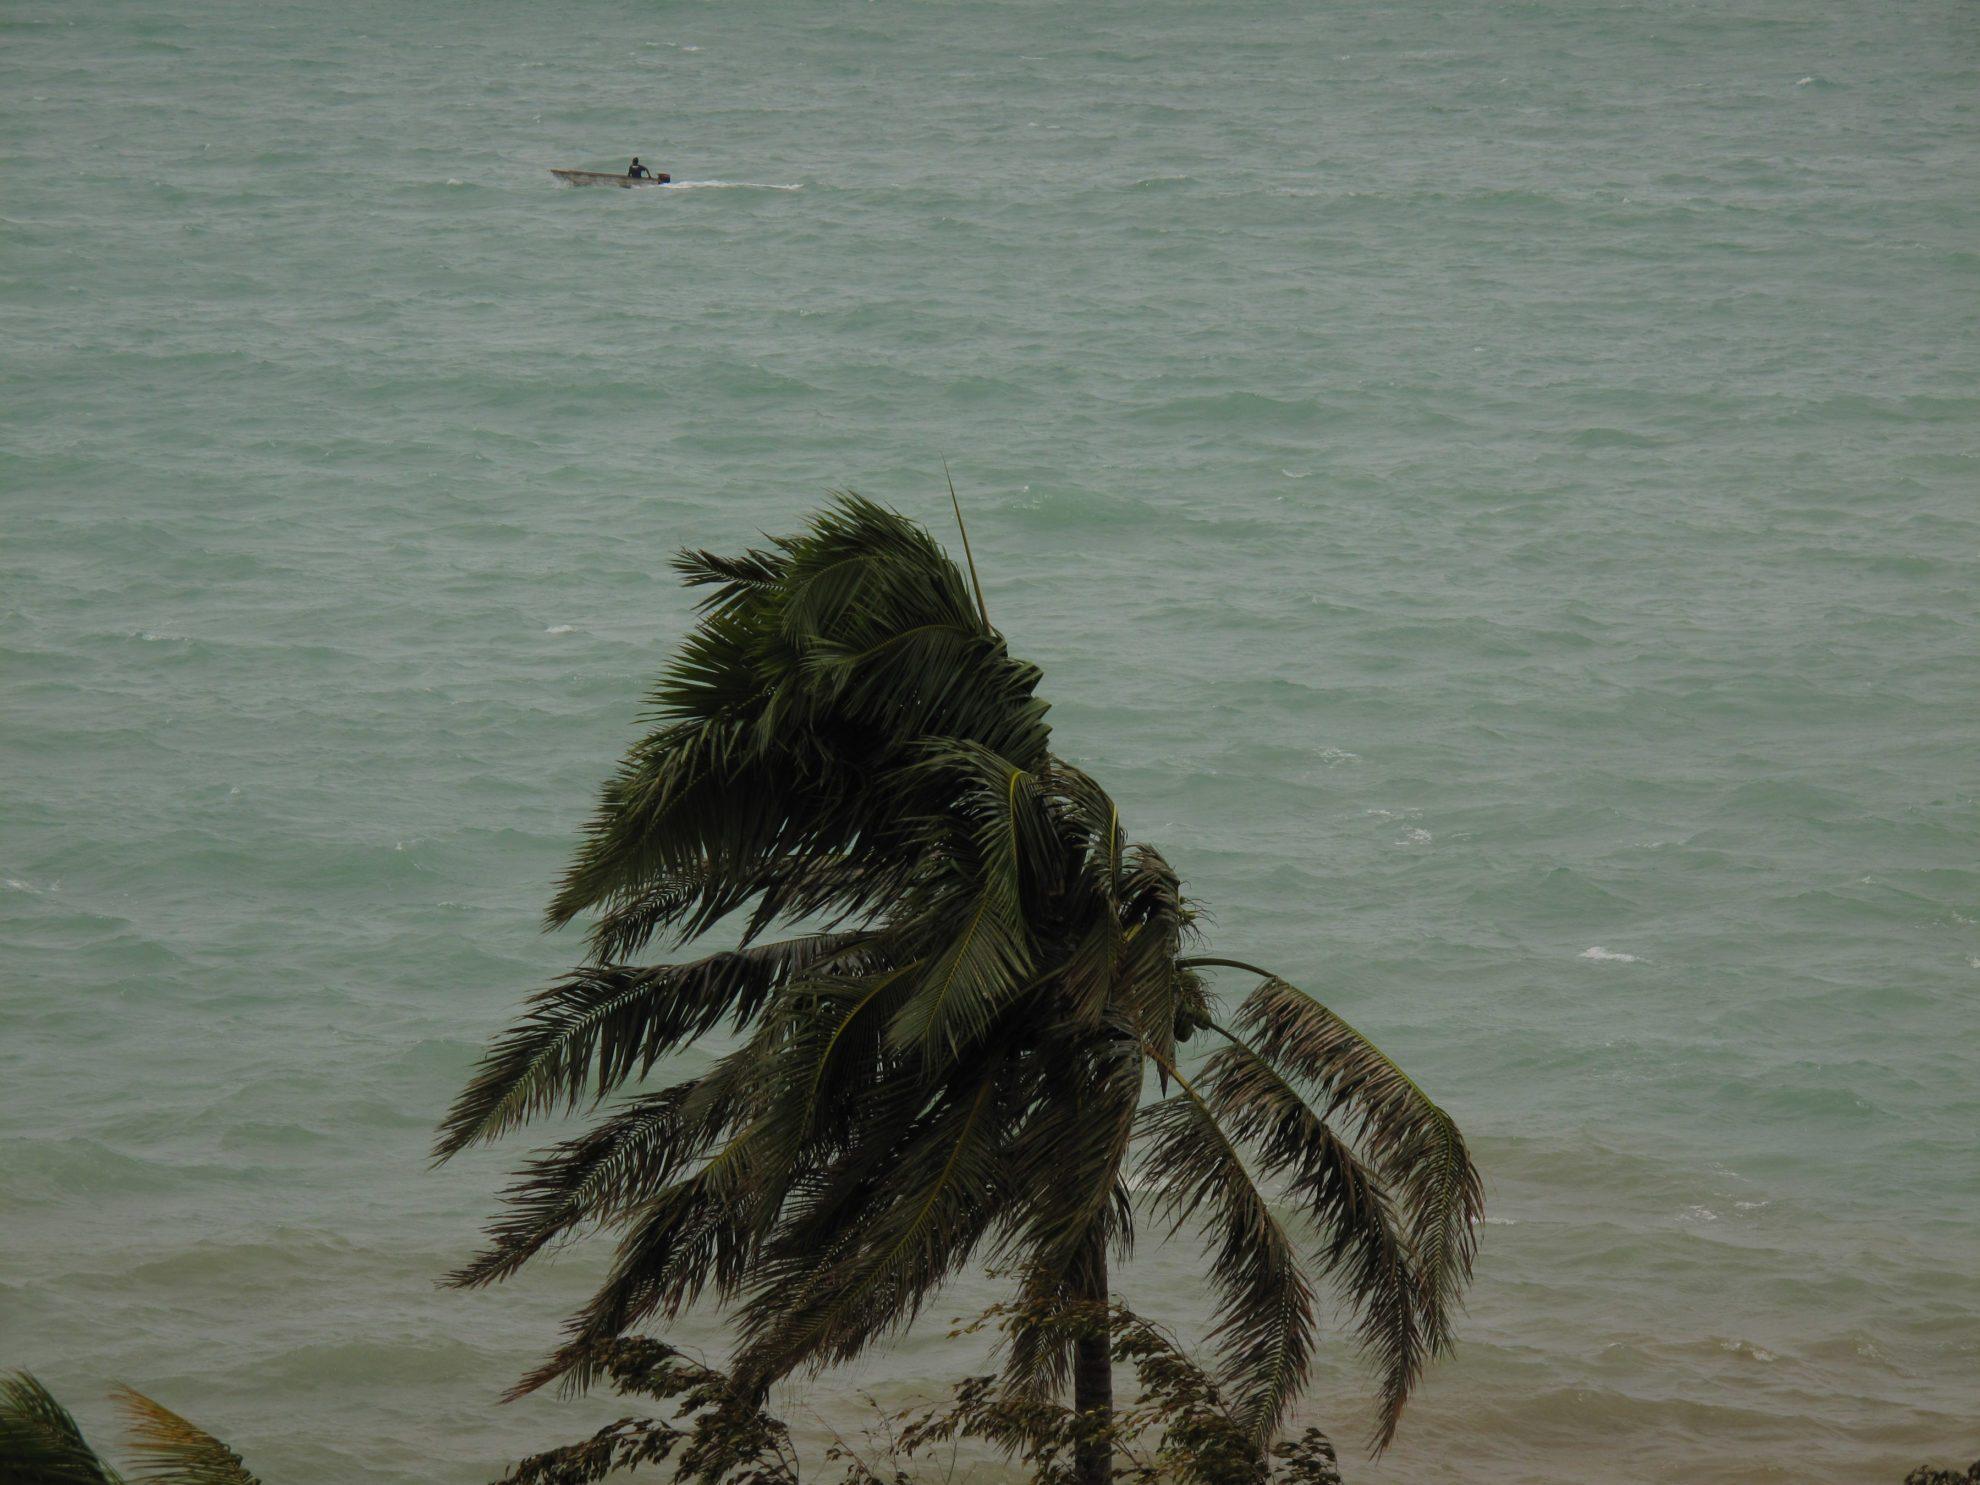 Damage done by Cyclone Ivy as it swept passed Port Vila, Vanuatu, 2011